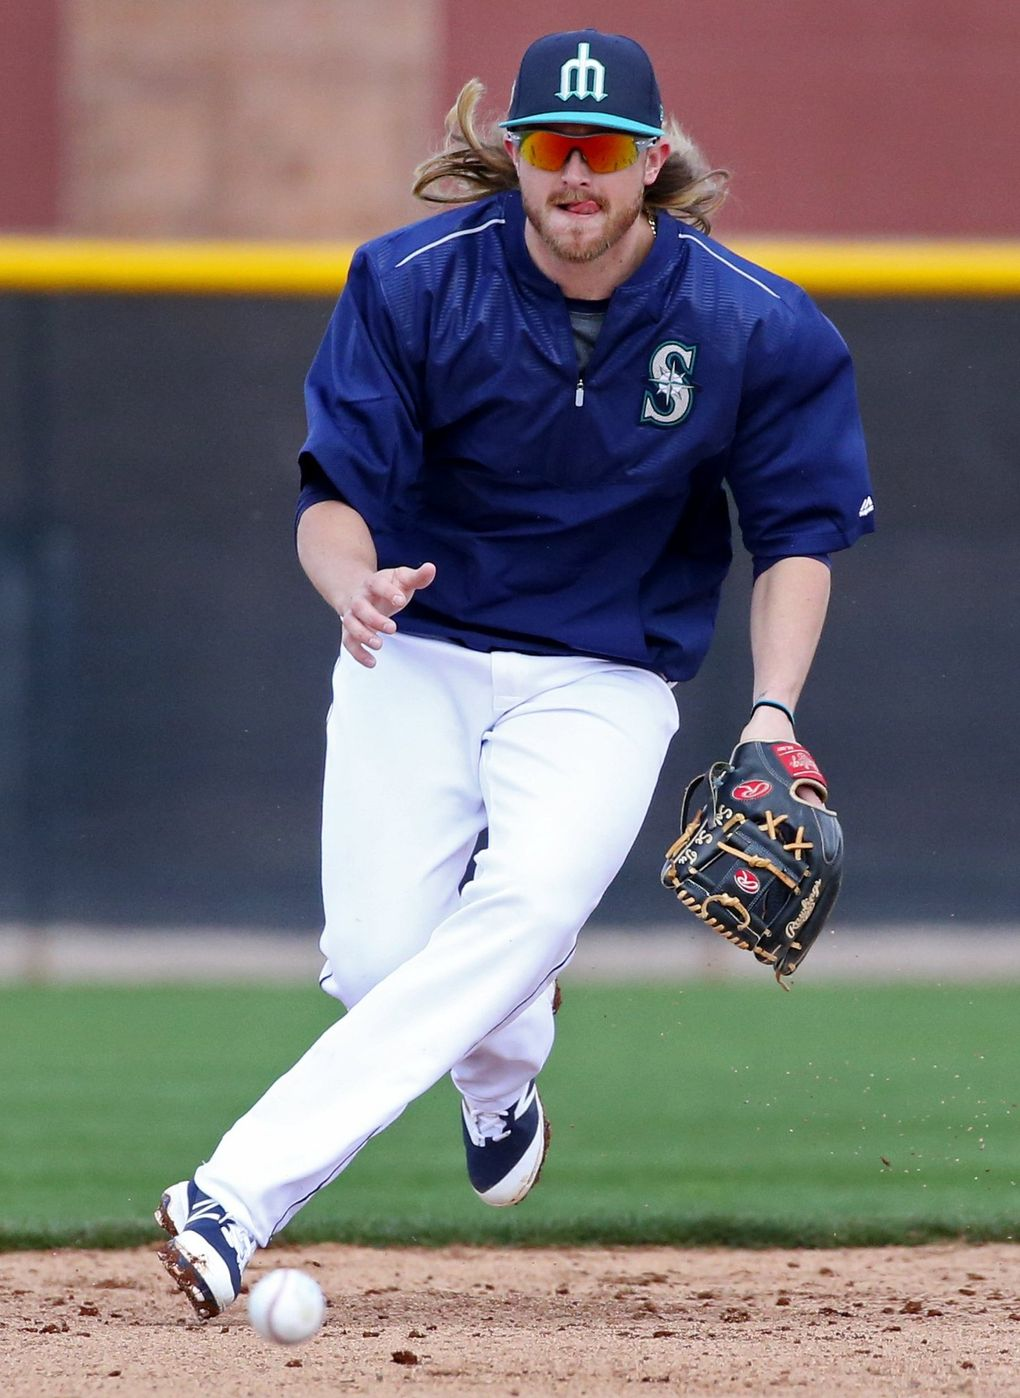 Taylor Motter during Mariners spring training, Monday, Feb. 20, 2017, in Peoria, Ariz. (Ken Lambert / The Seattle Times)